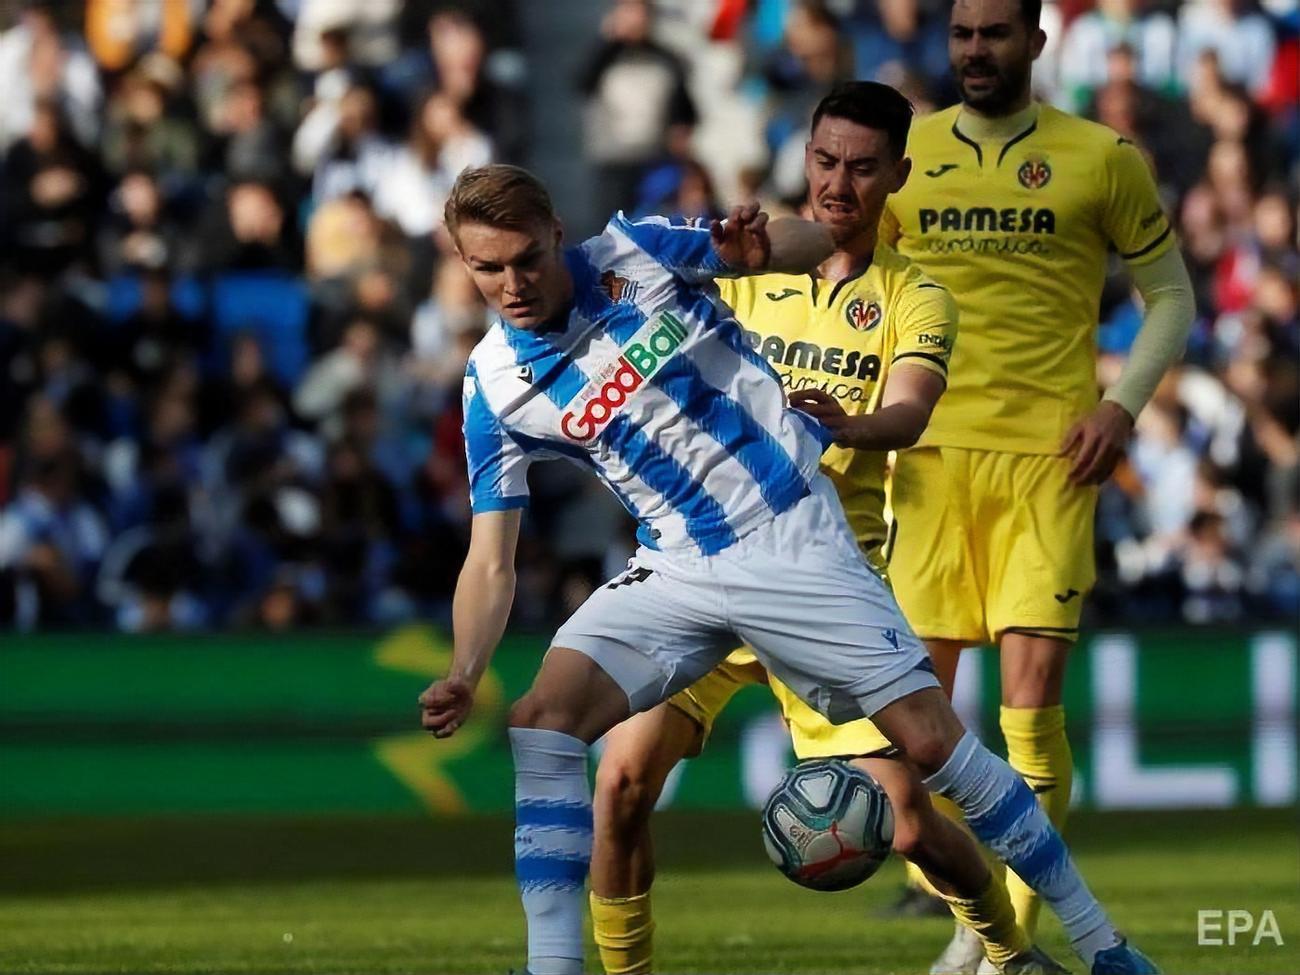 Футбол испания запись барселона- реал сосьедад